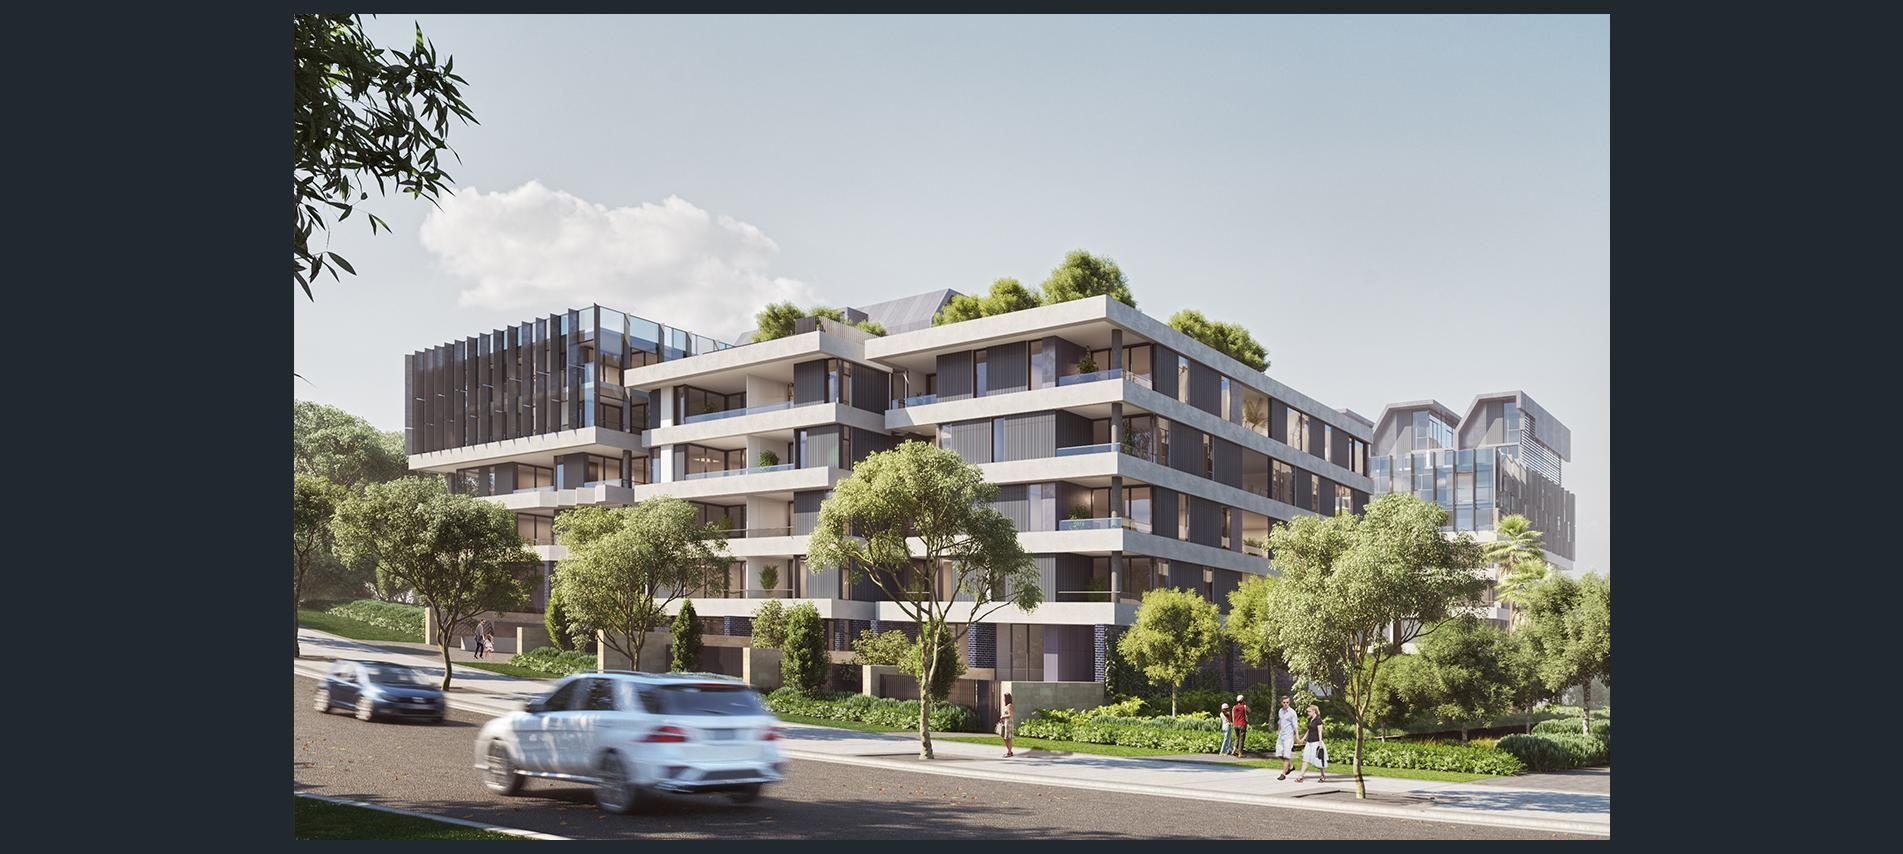 G02/37 Nancarrow Ave, Meadowbank NSW 2114, Image 0